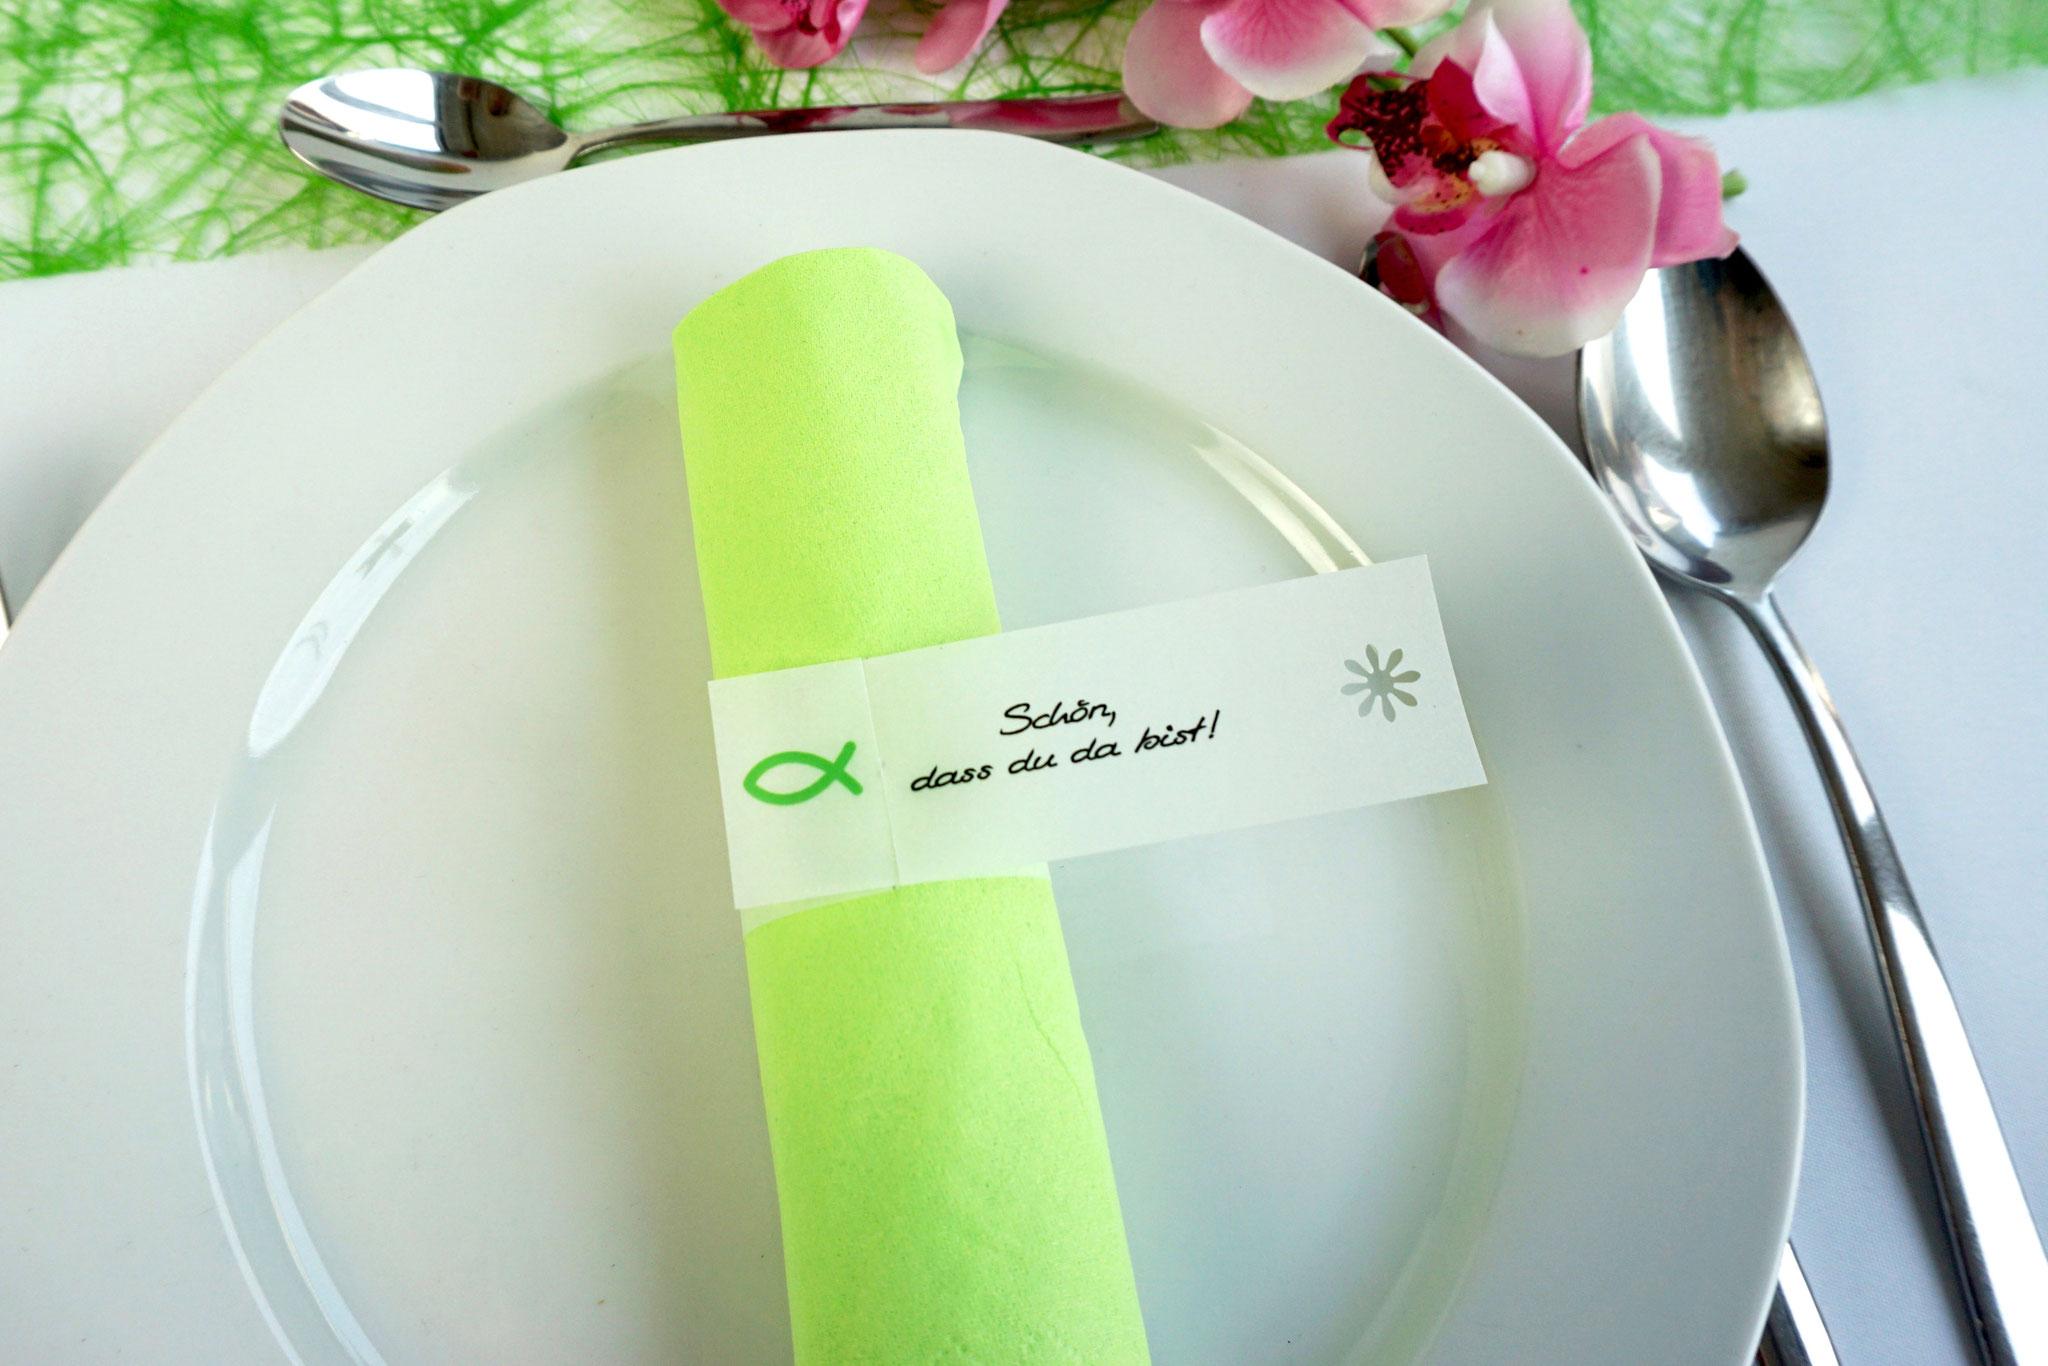 Serviettenring Design Fisch Silhouette, Farbe Apfelgrün, Randabschluss Blümchen